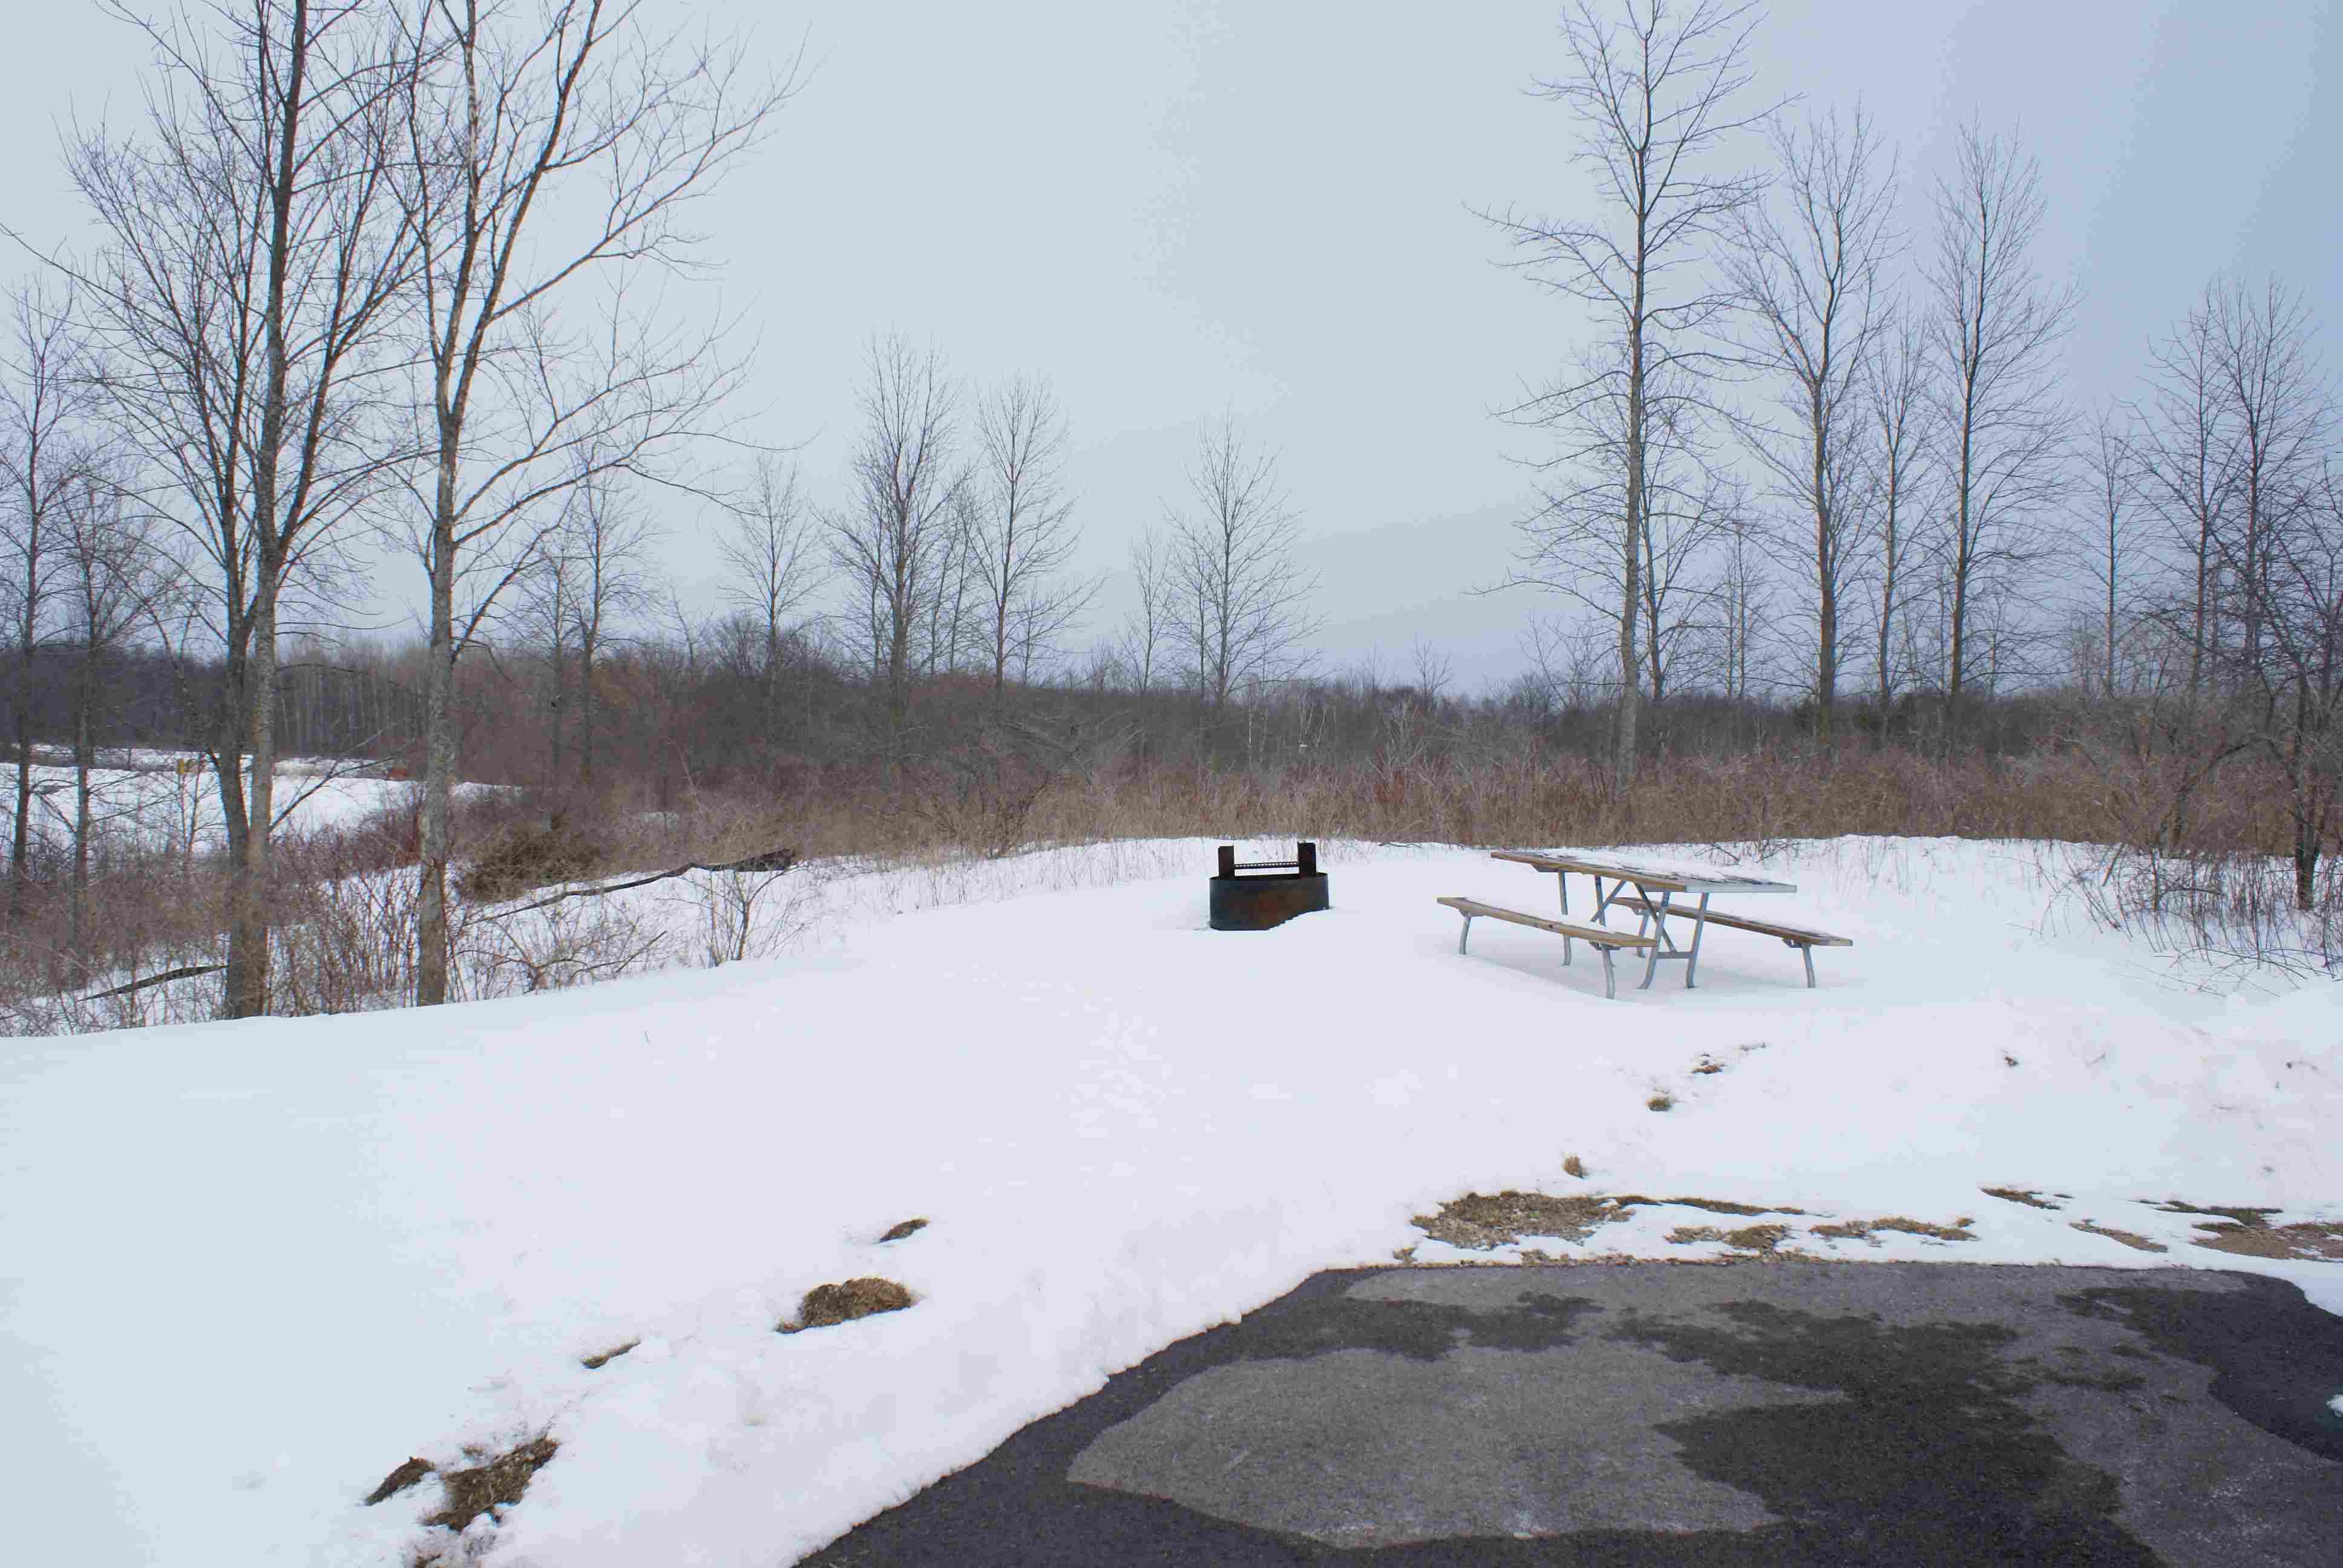 Harrington Beach State Park Campground Wisconsin in winter